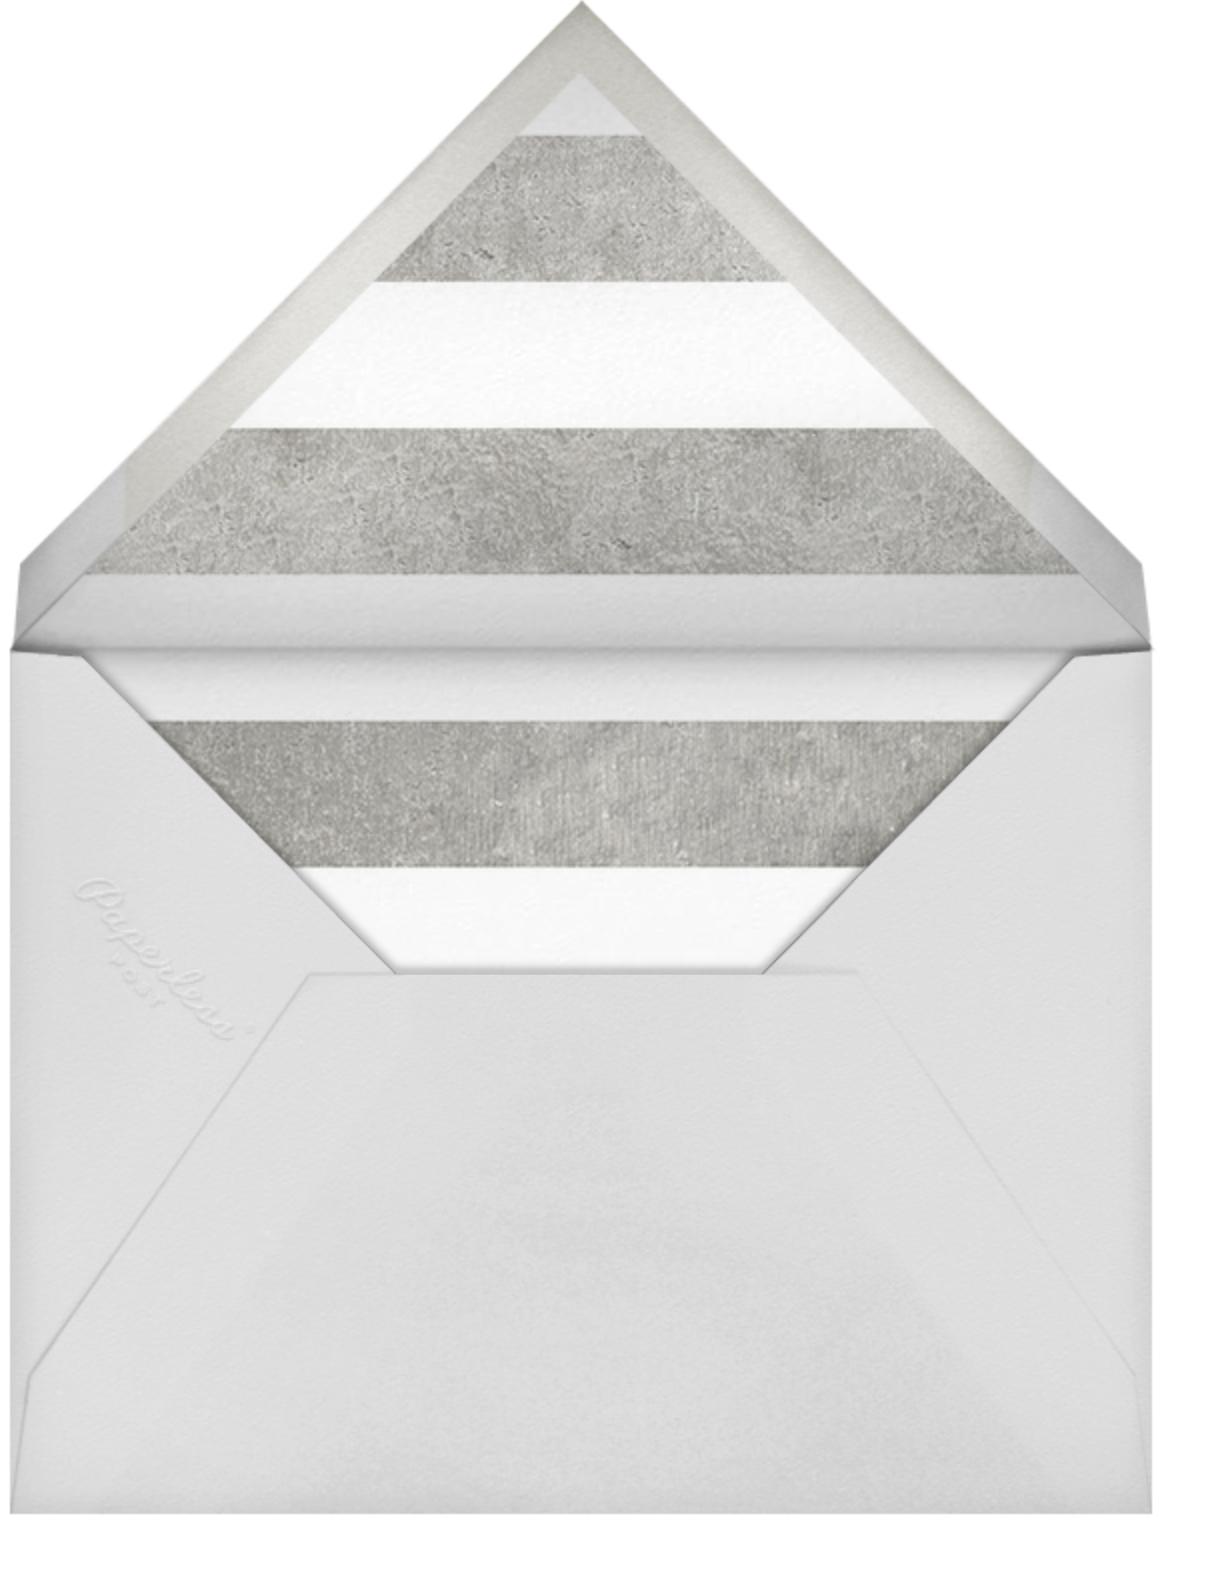 Luminous Heart - White/Silver - Sugar Paper - Engagement party - envelope back